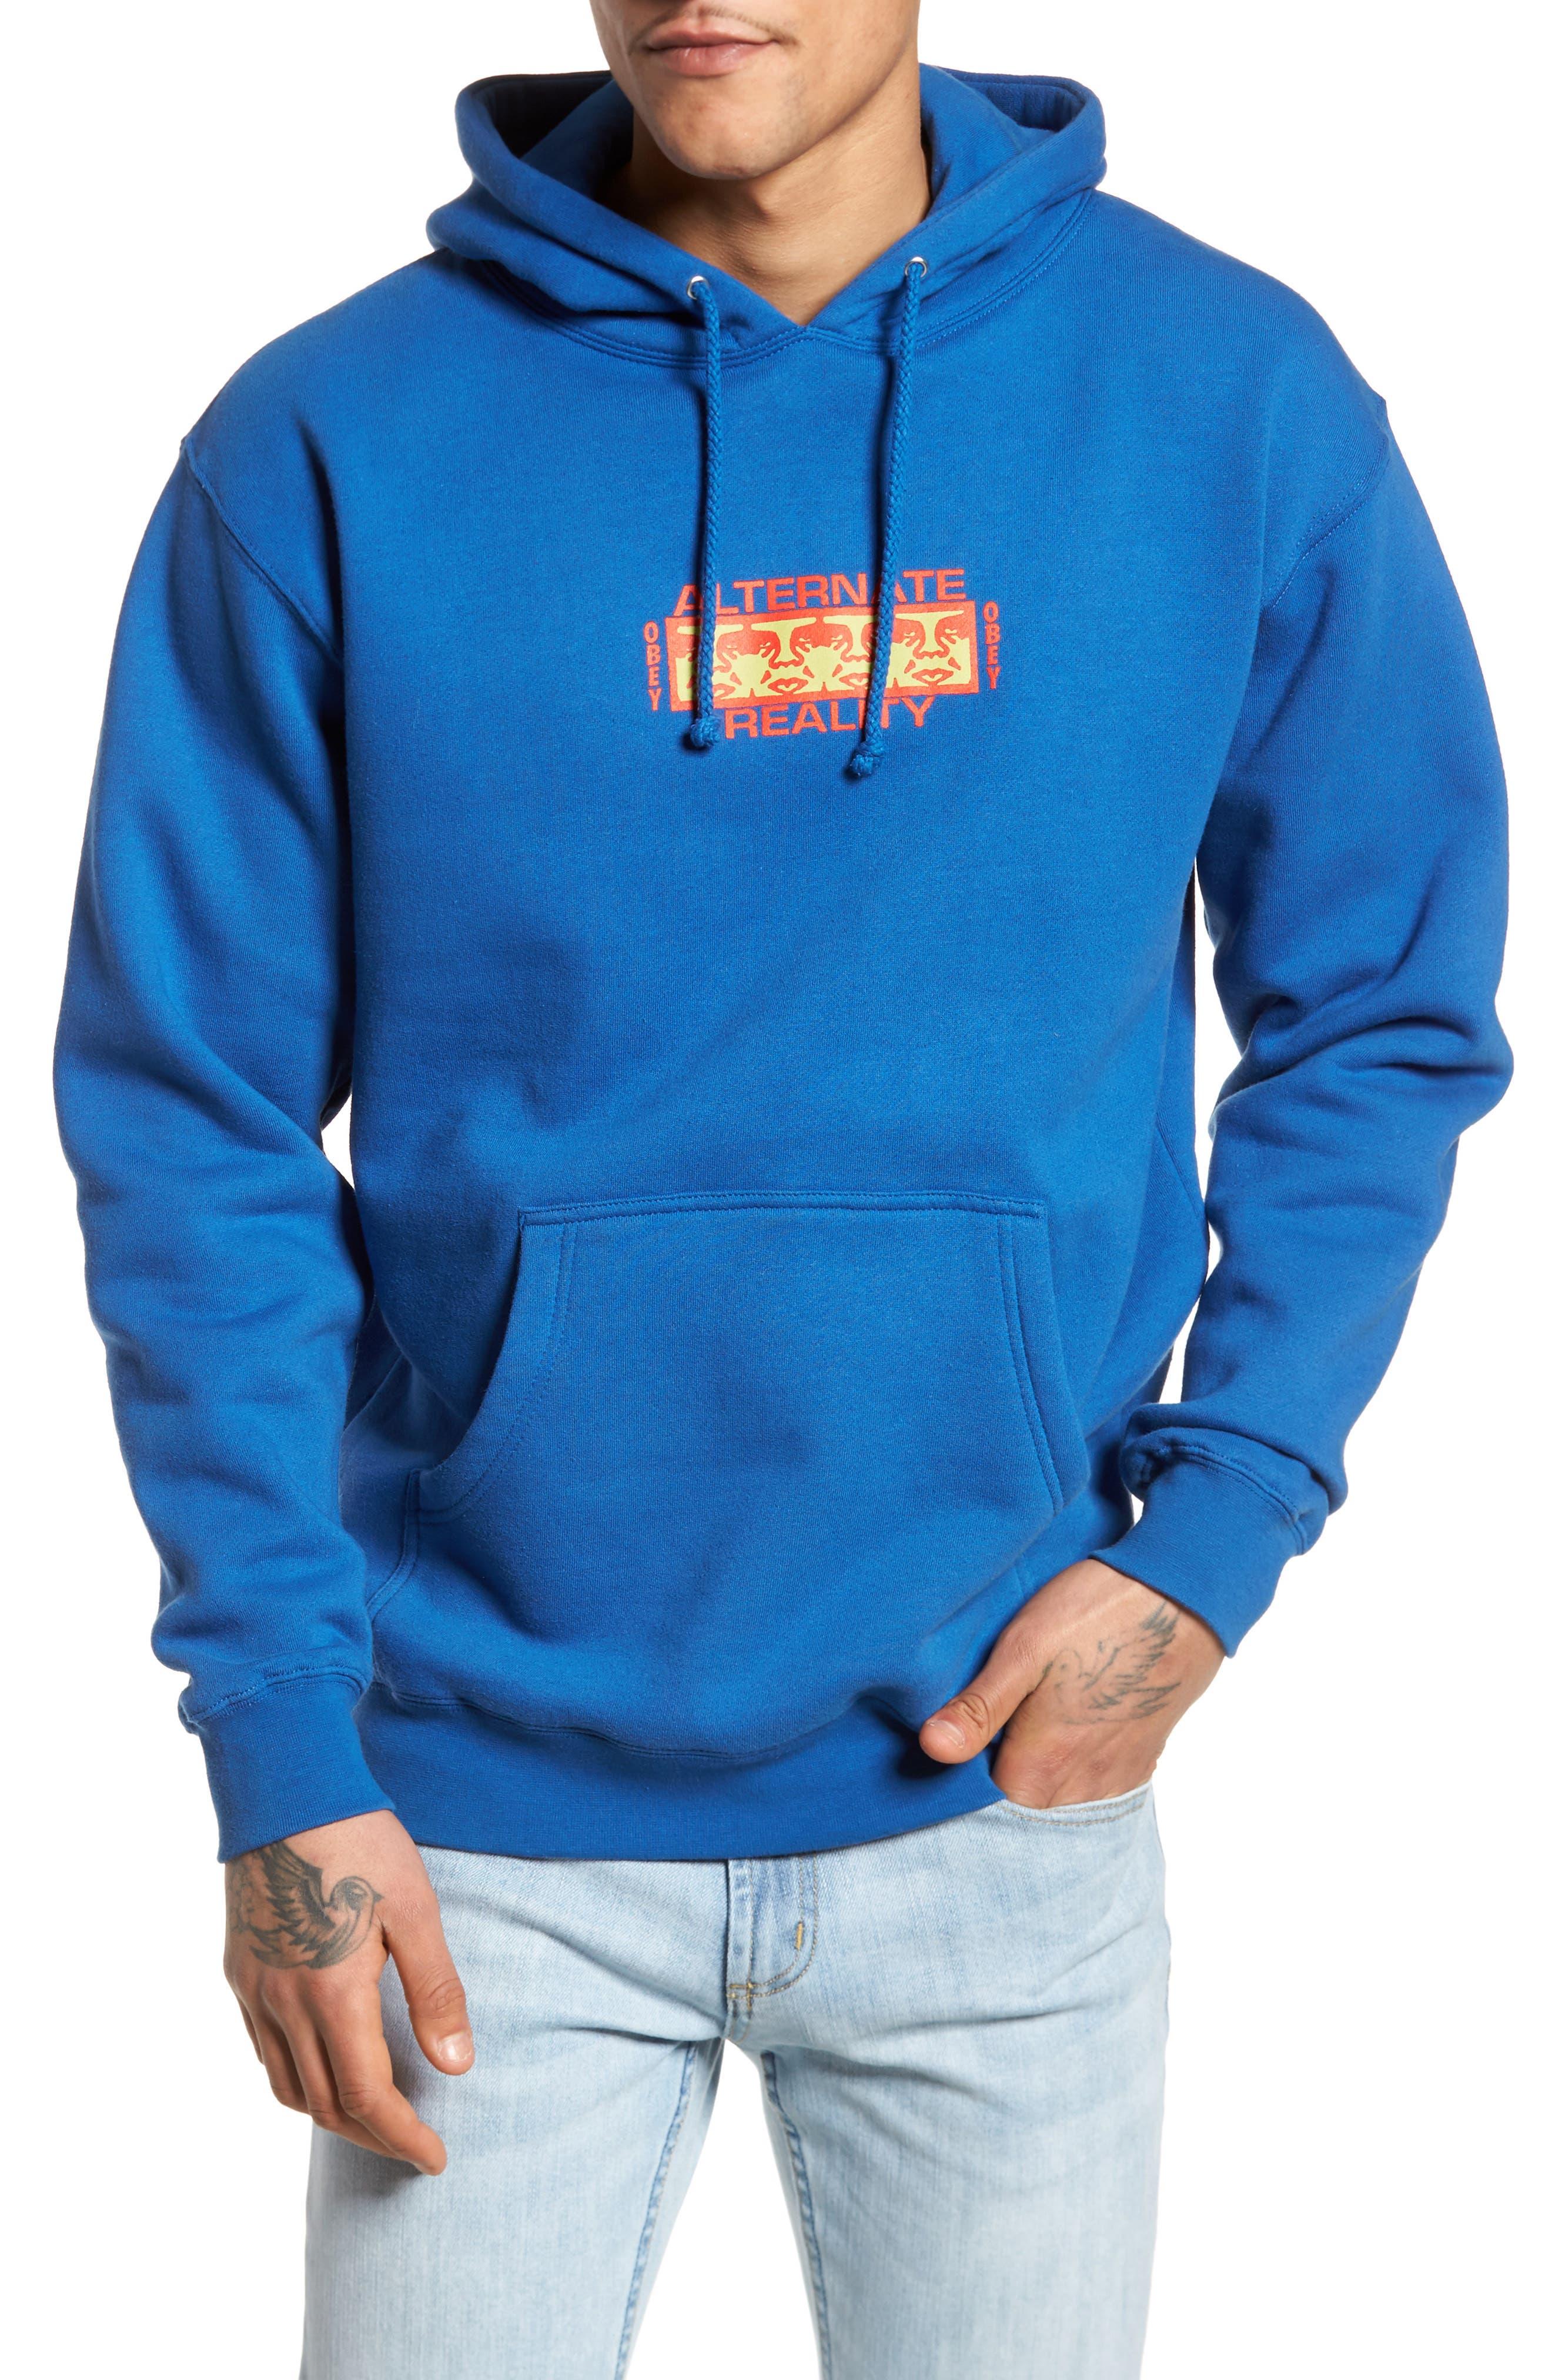 Alternate Reality Hoodie Sweatshirt,                         Main,                         color, Royal Blue